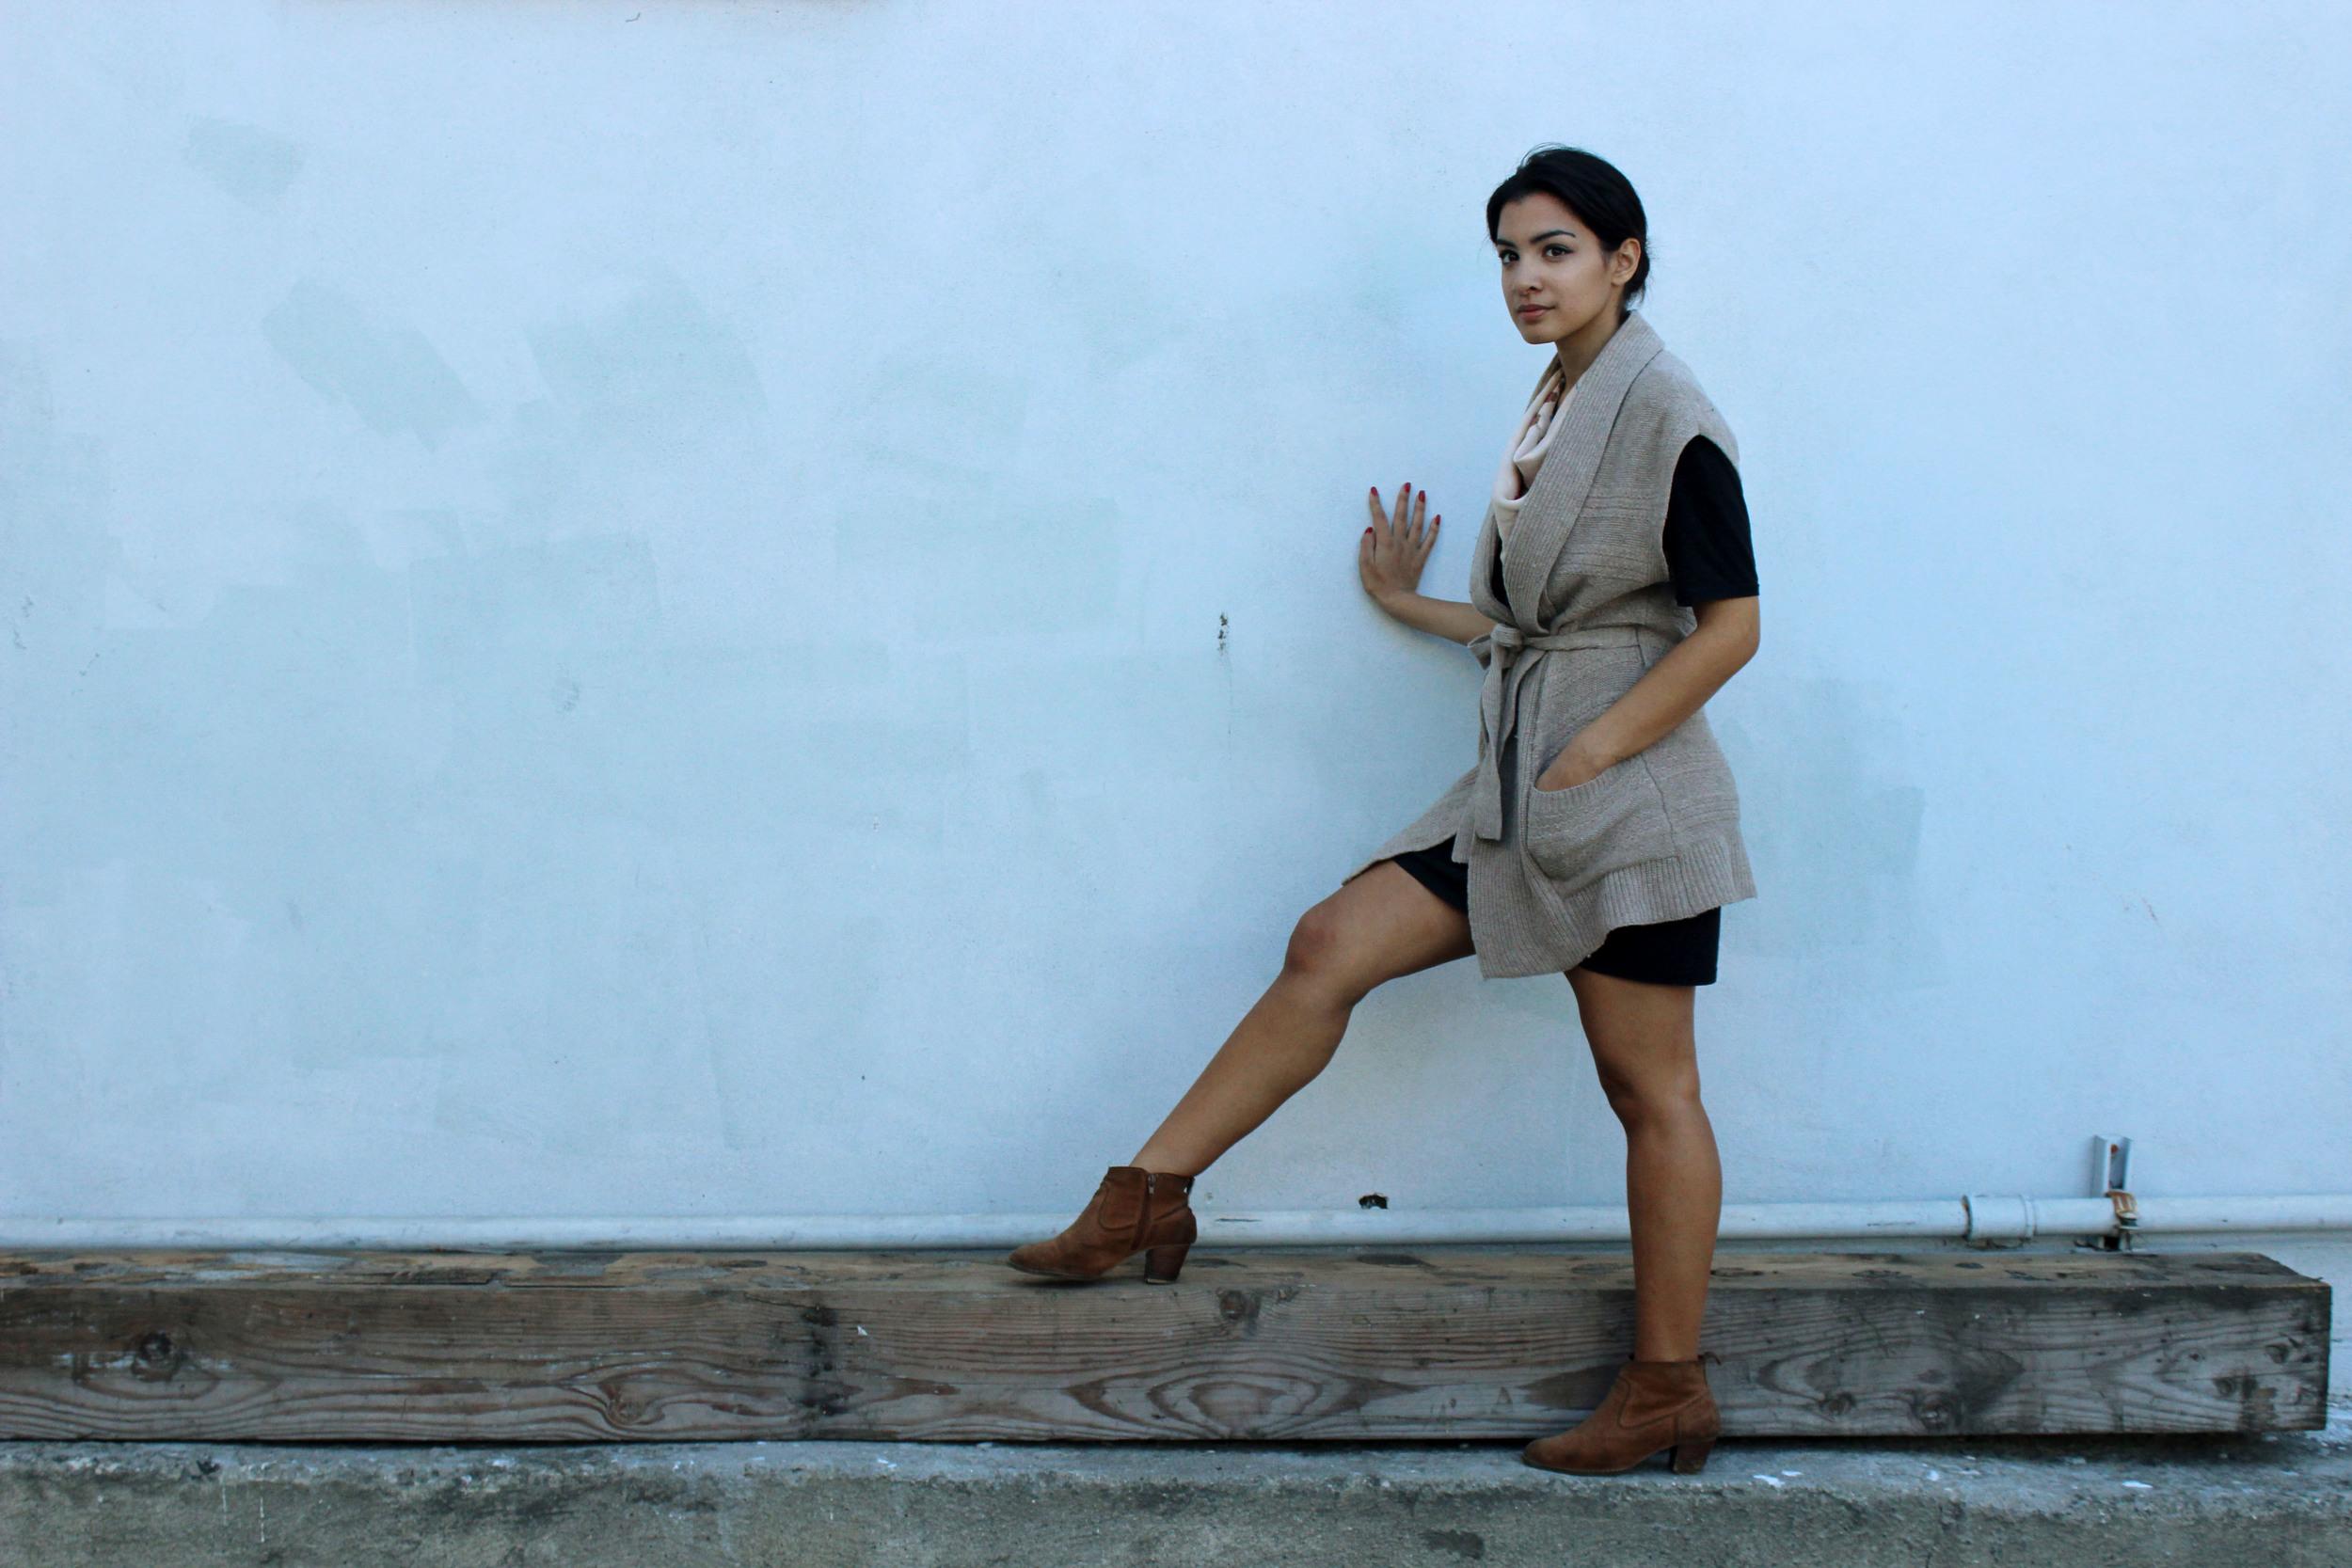 Sweater: The Gap Dress: H&M Scarf: Dior Shoes: Dolce Vita